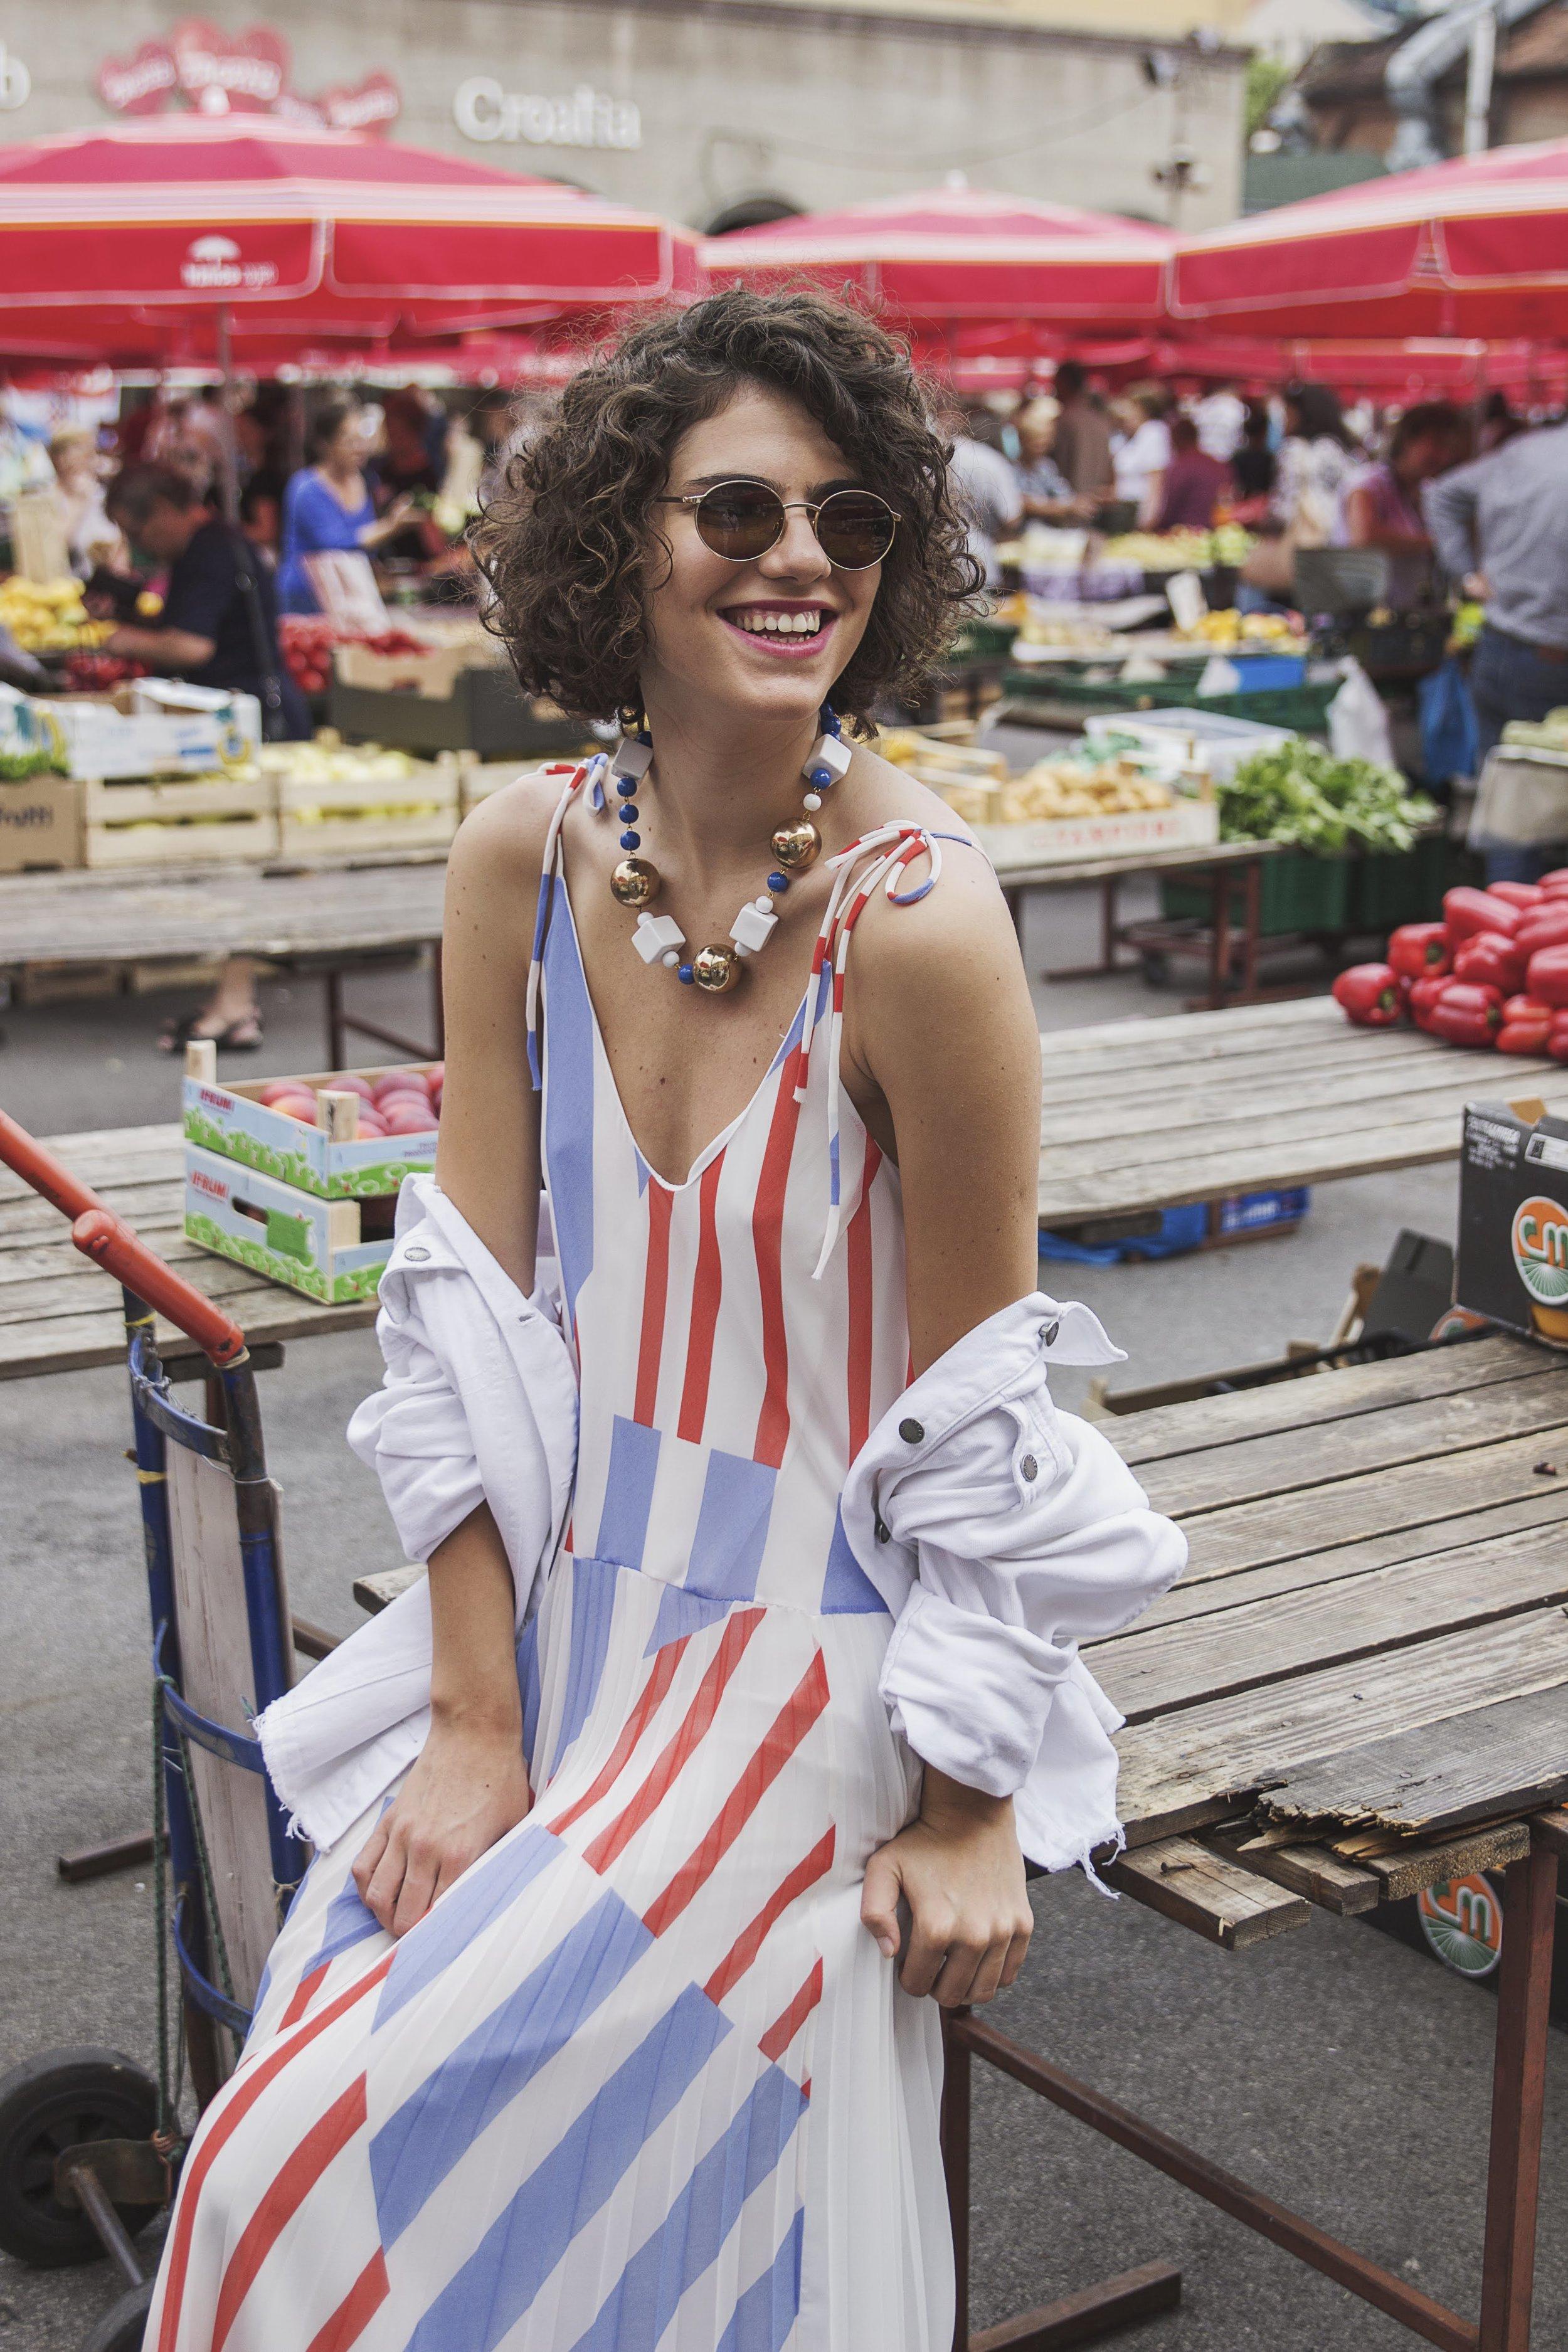 luka-lajic-fashion-photography-robert-sever-dizajner-croatian (11).jpg